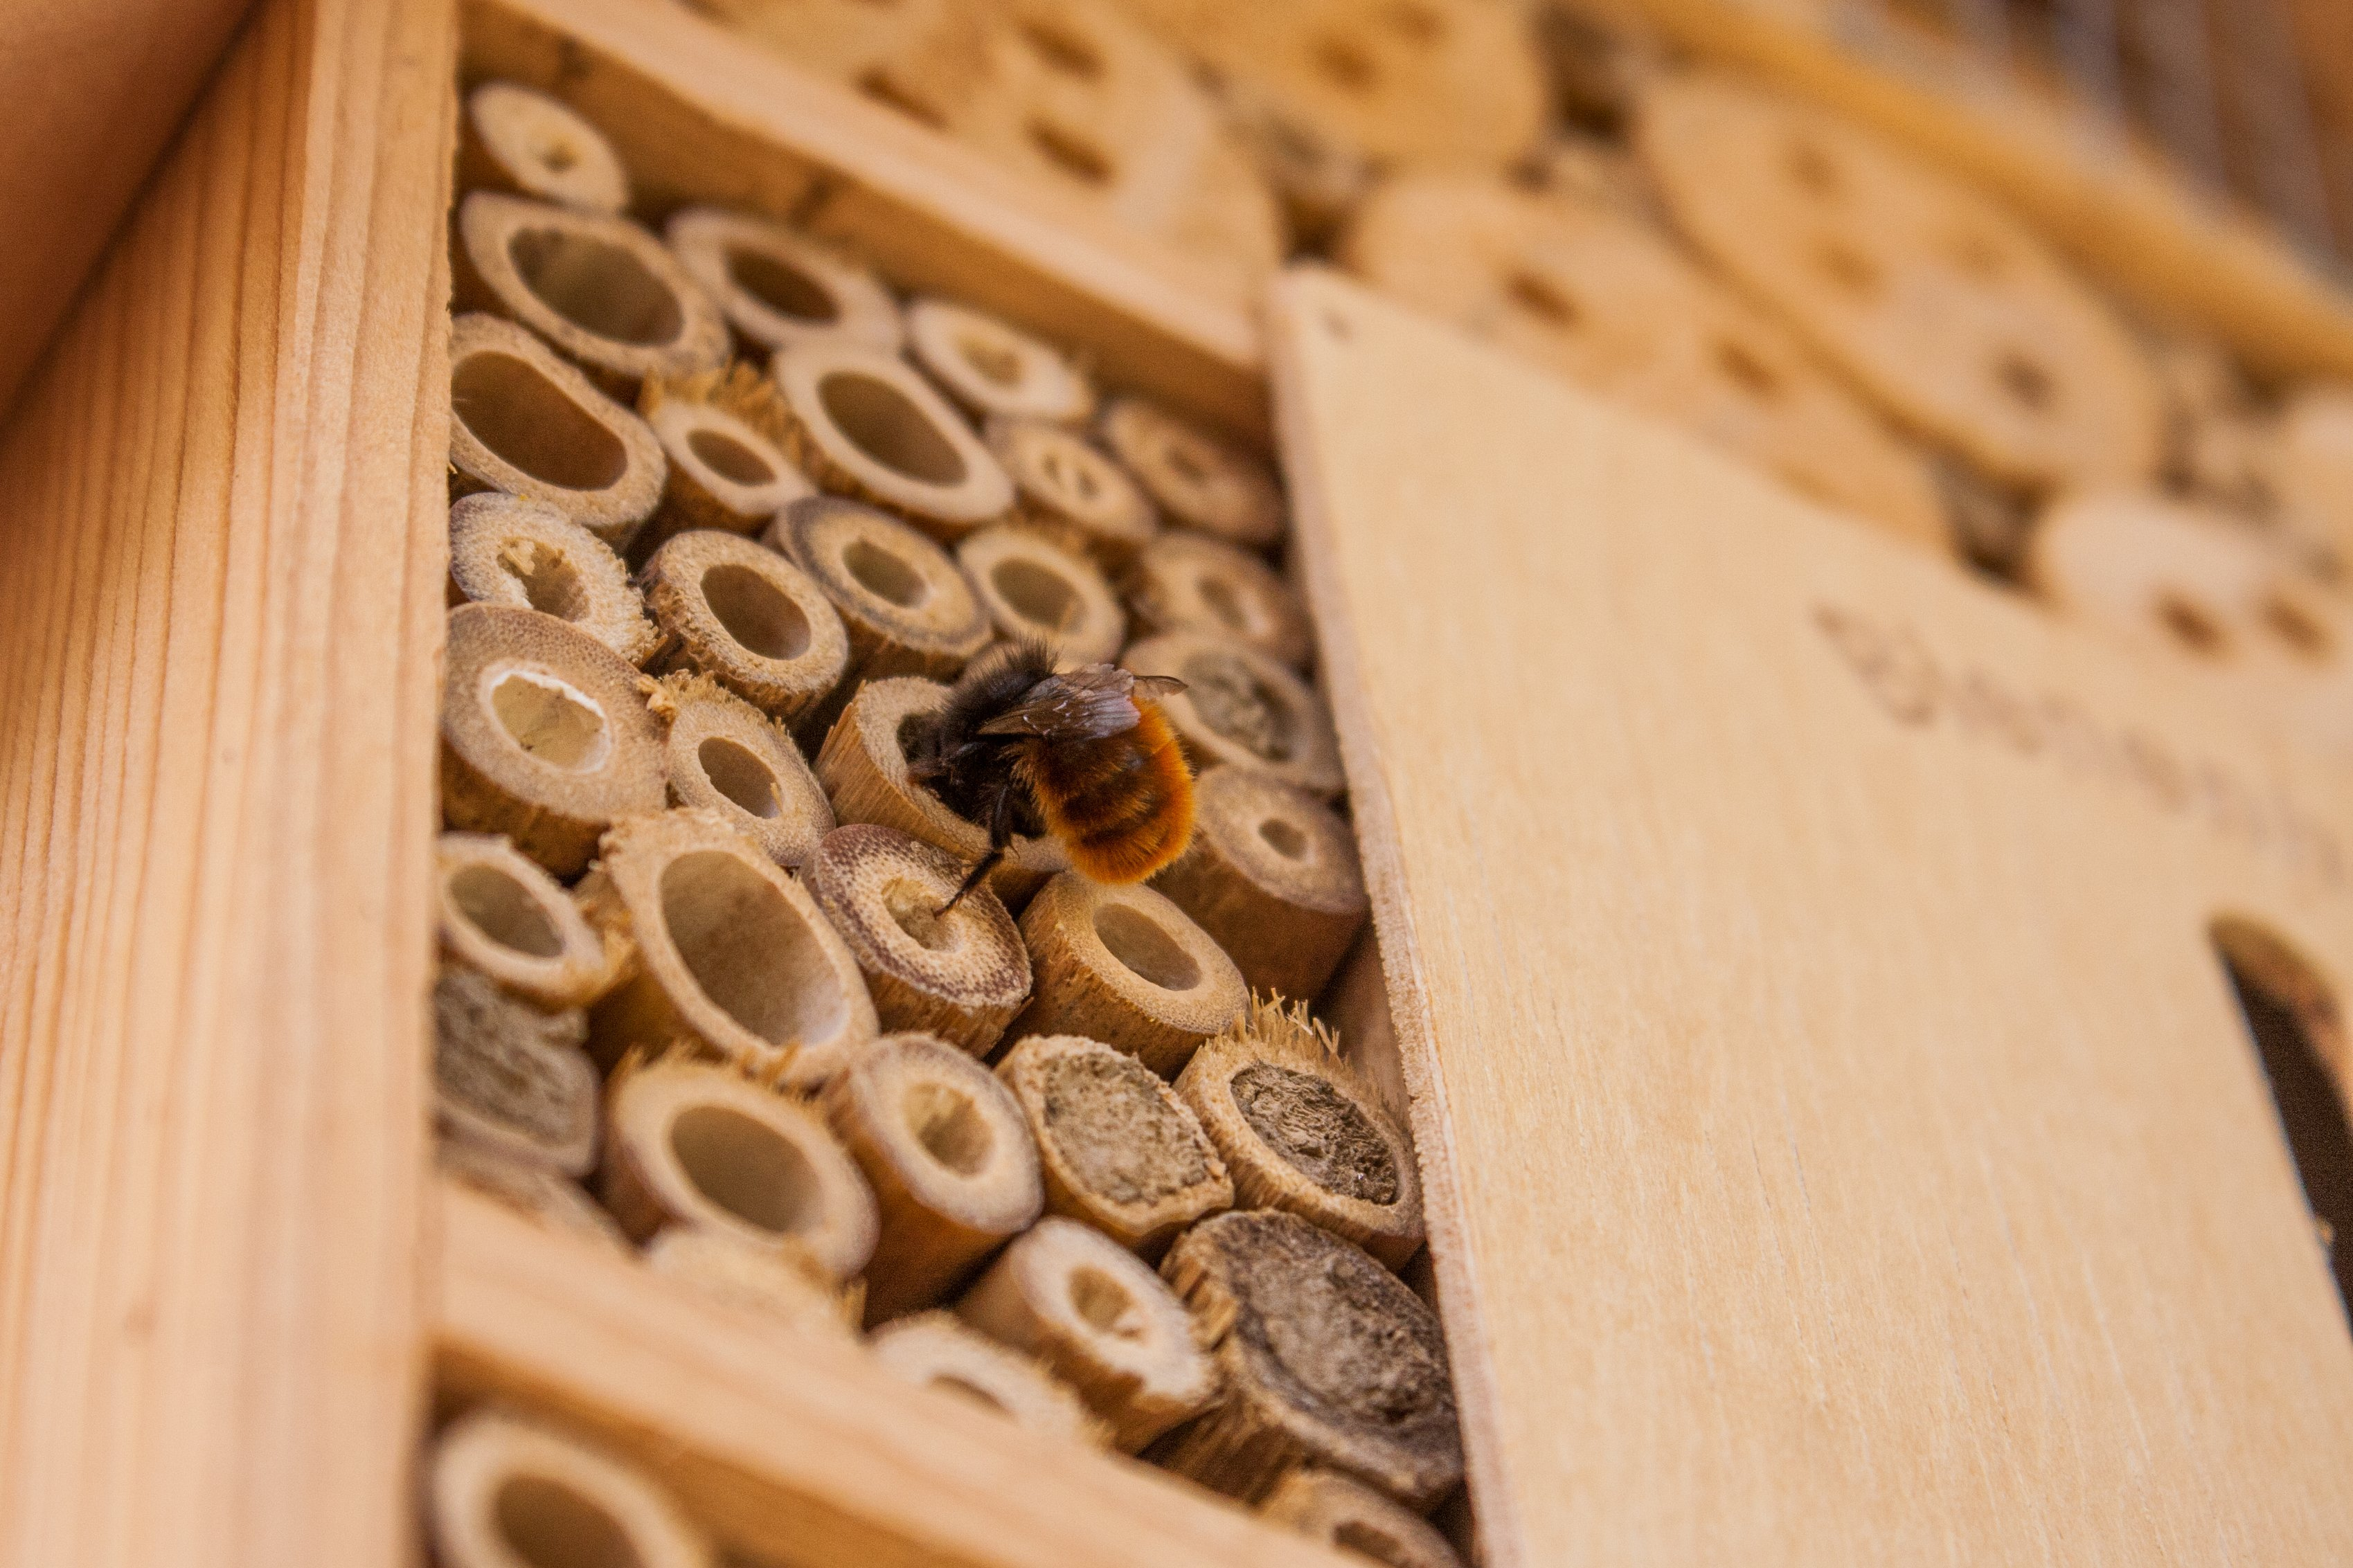 Meet the Mason Bee: A Solution to Declining Honeybee Populations